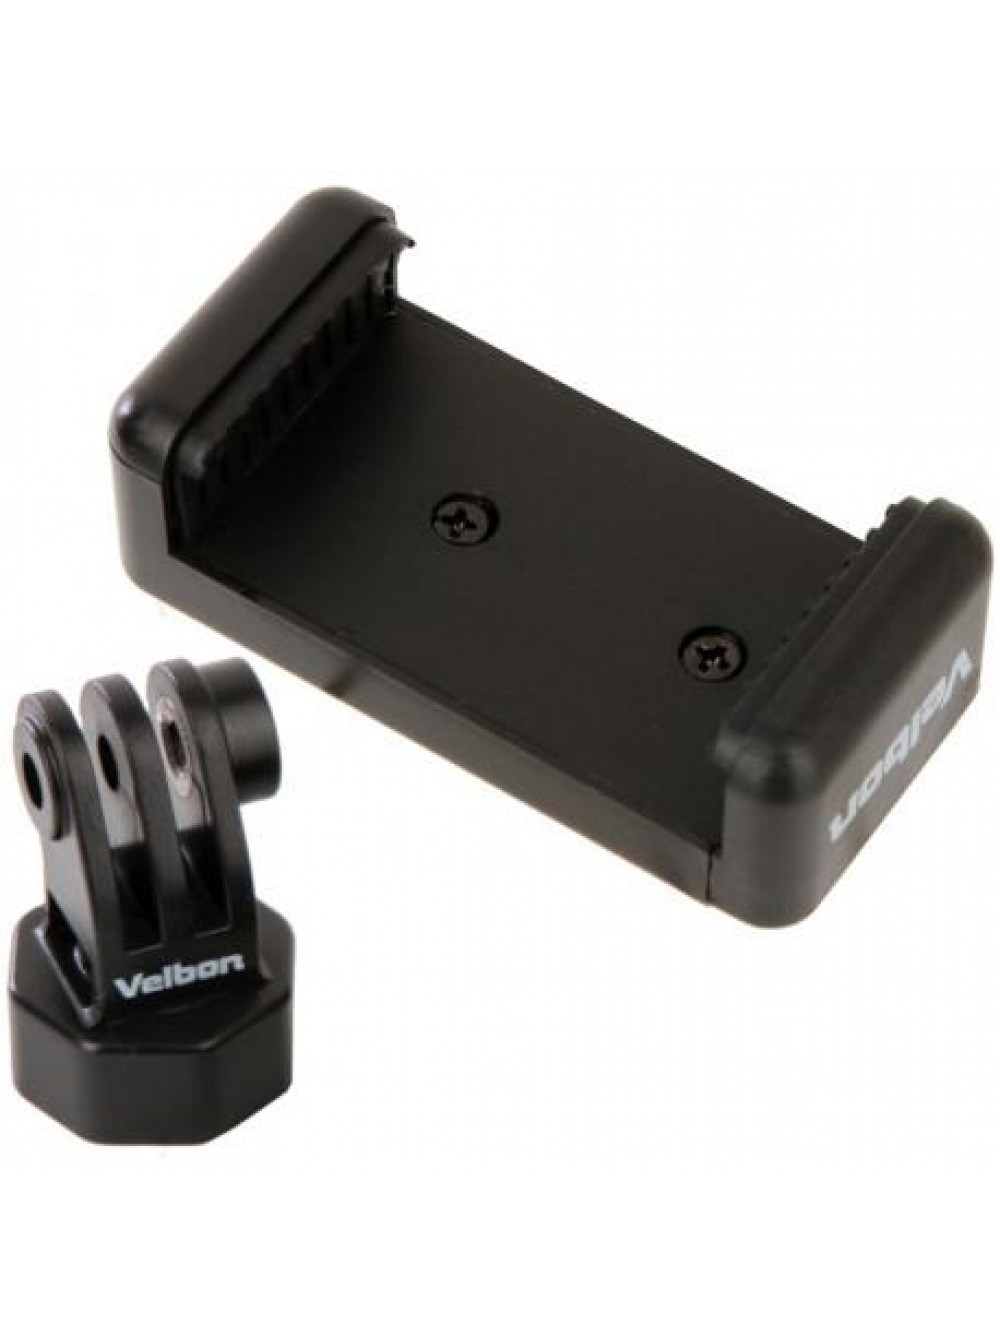 Комплект адаптера Velbon M-kit